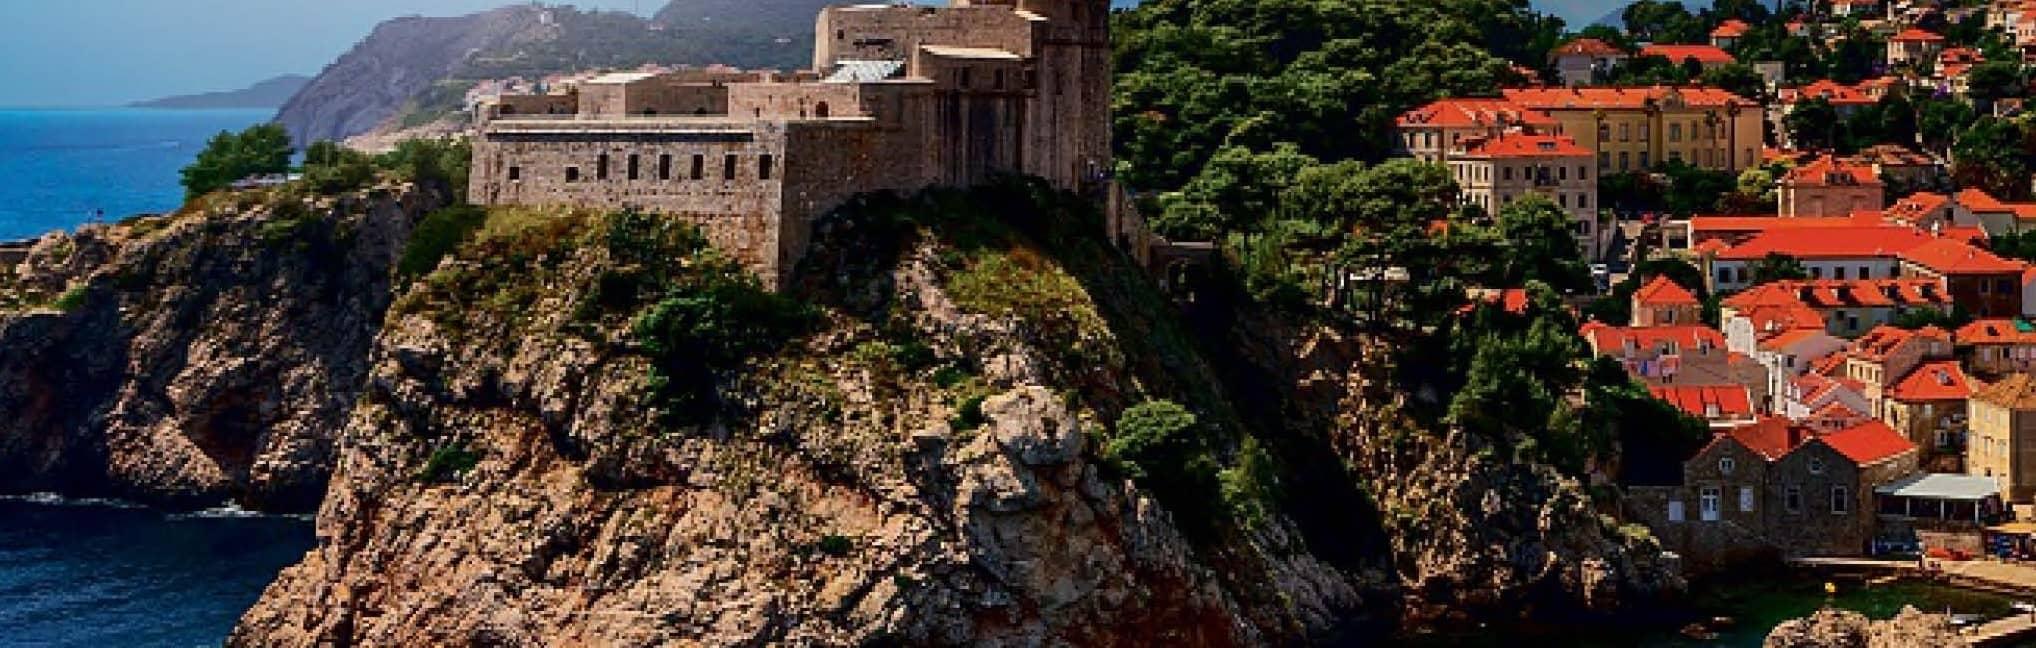 A Breath Of Fresh Air In Dubrovnik